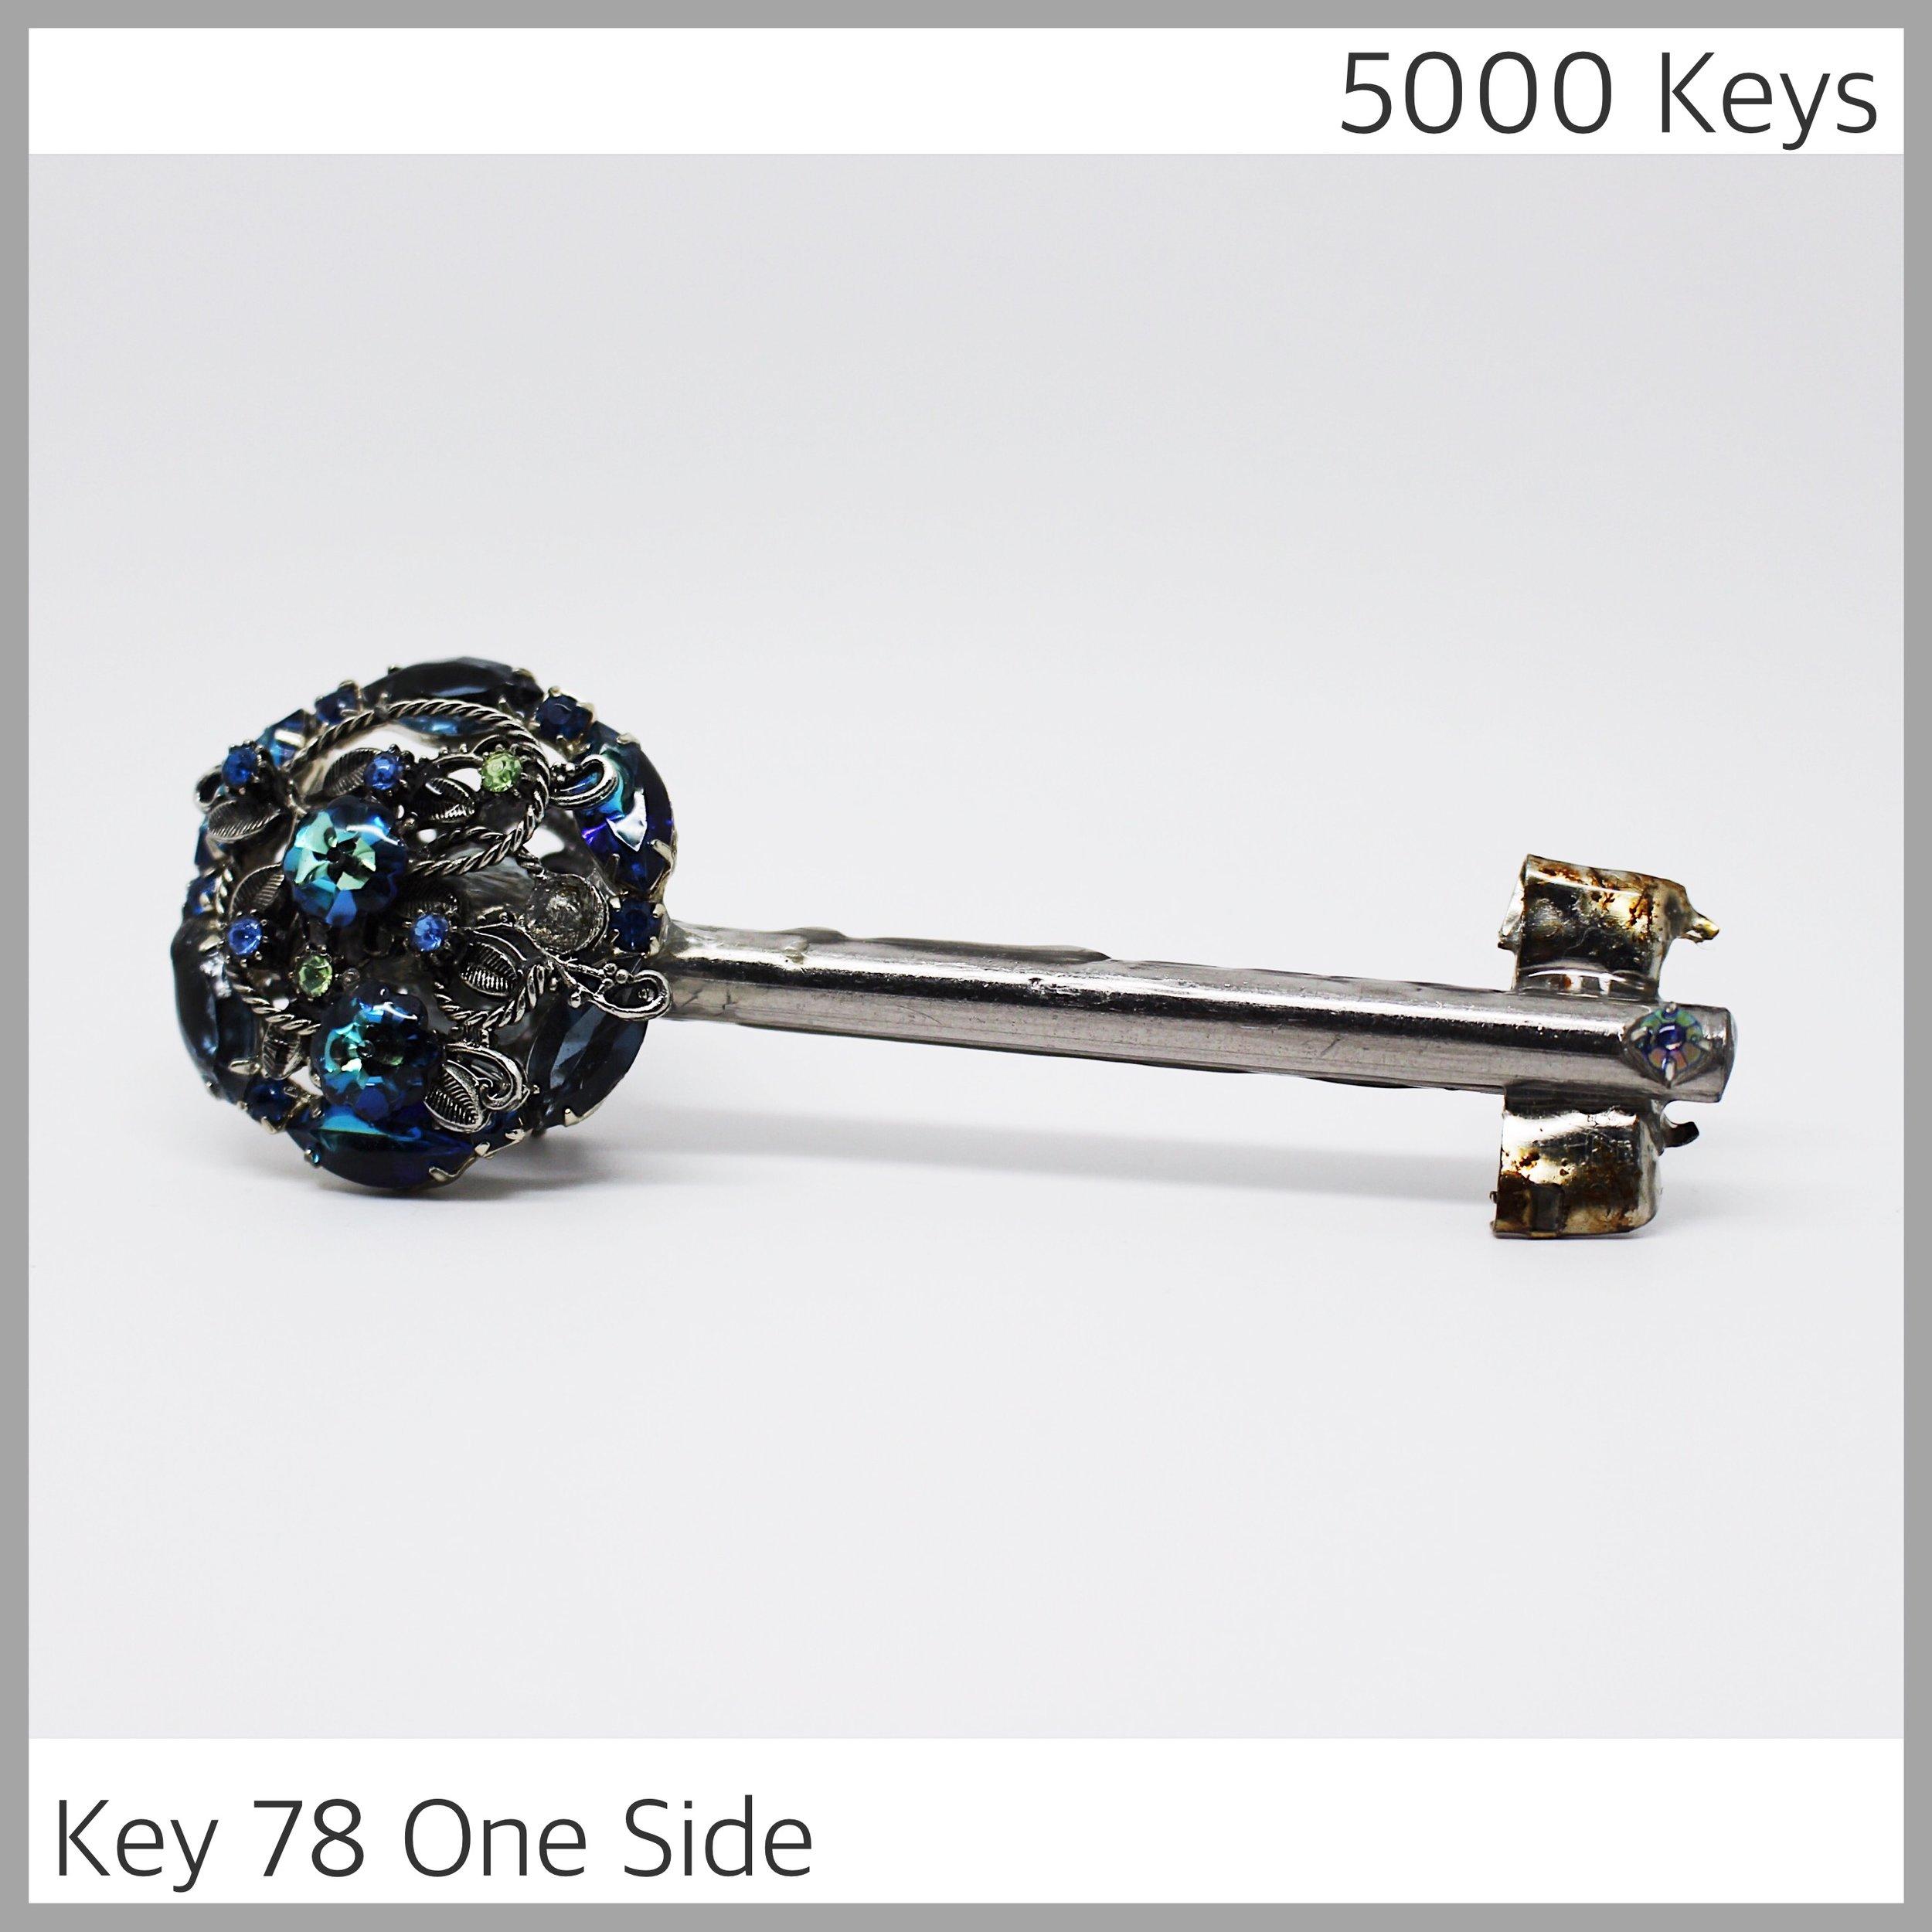 Key 78 one side - 1.JPG